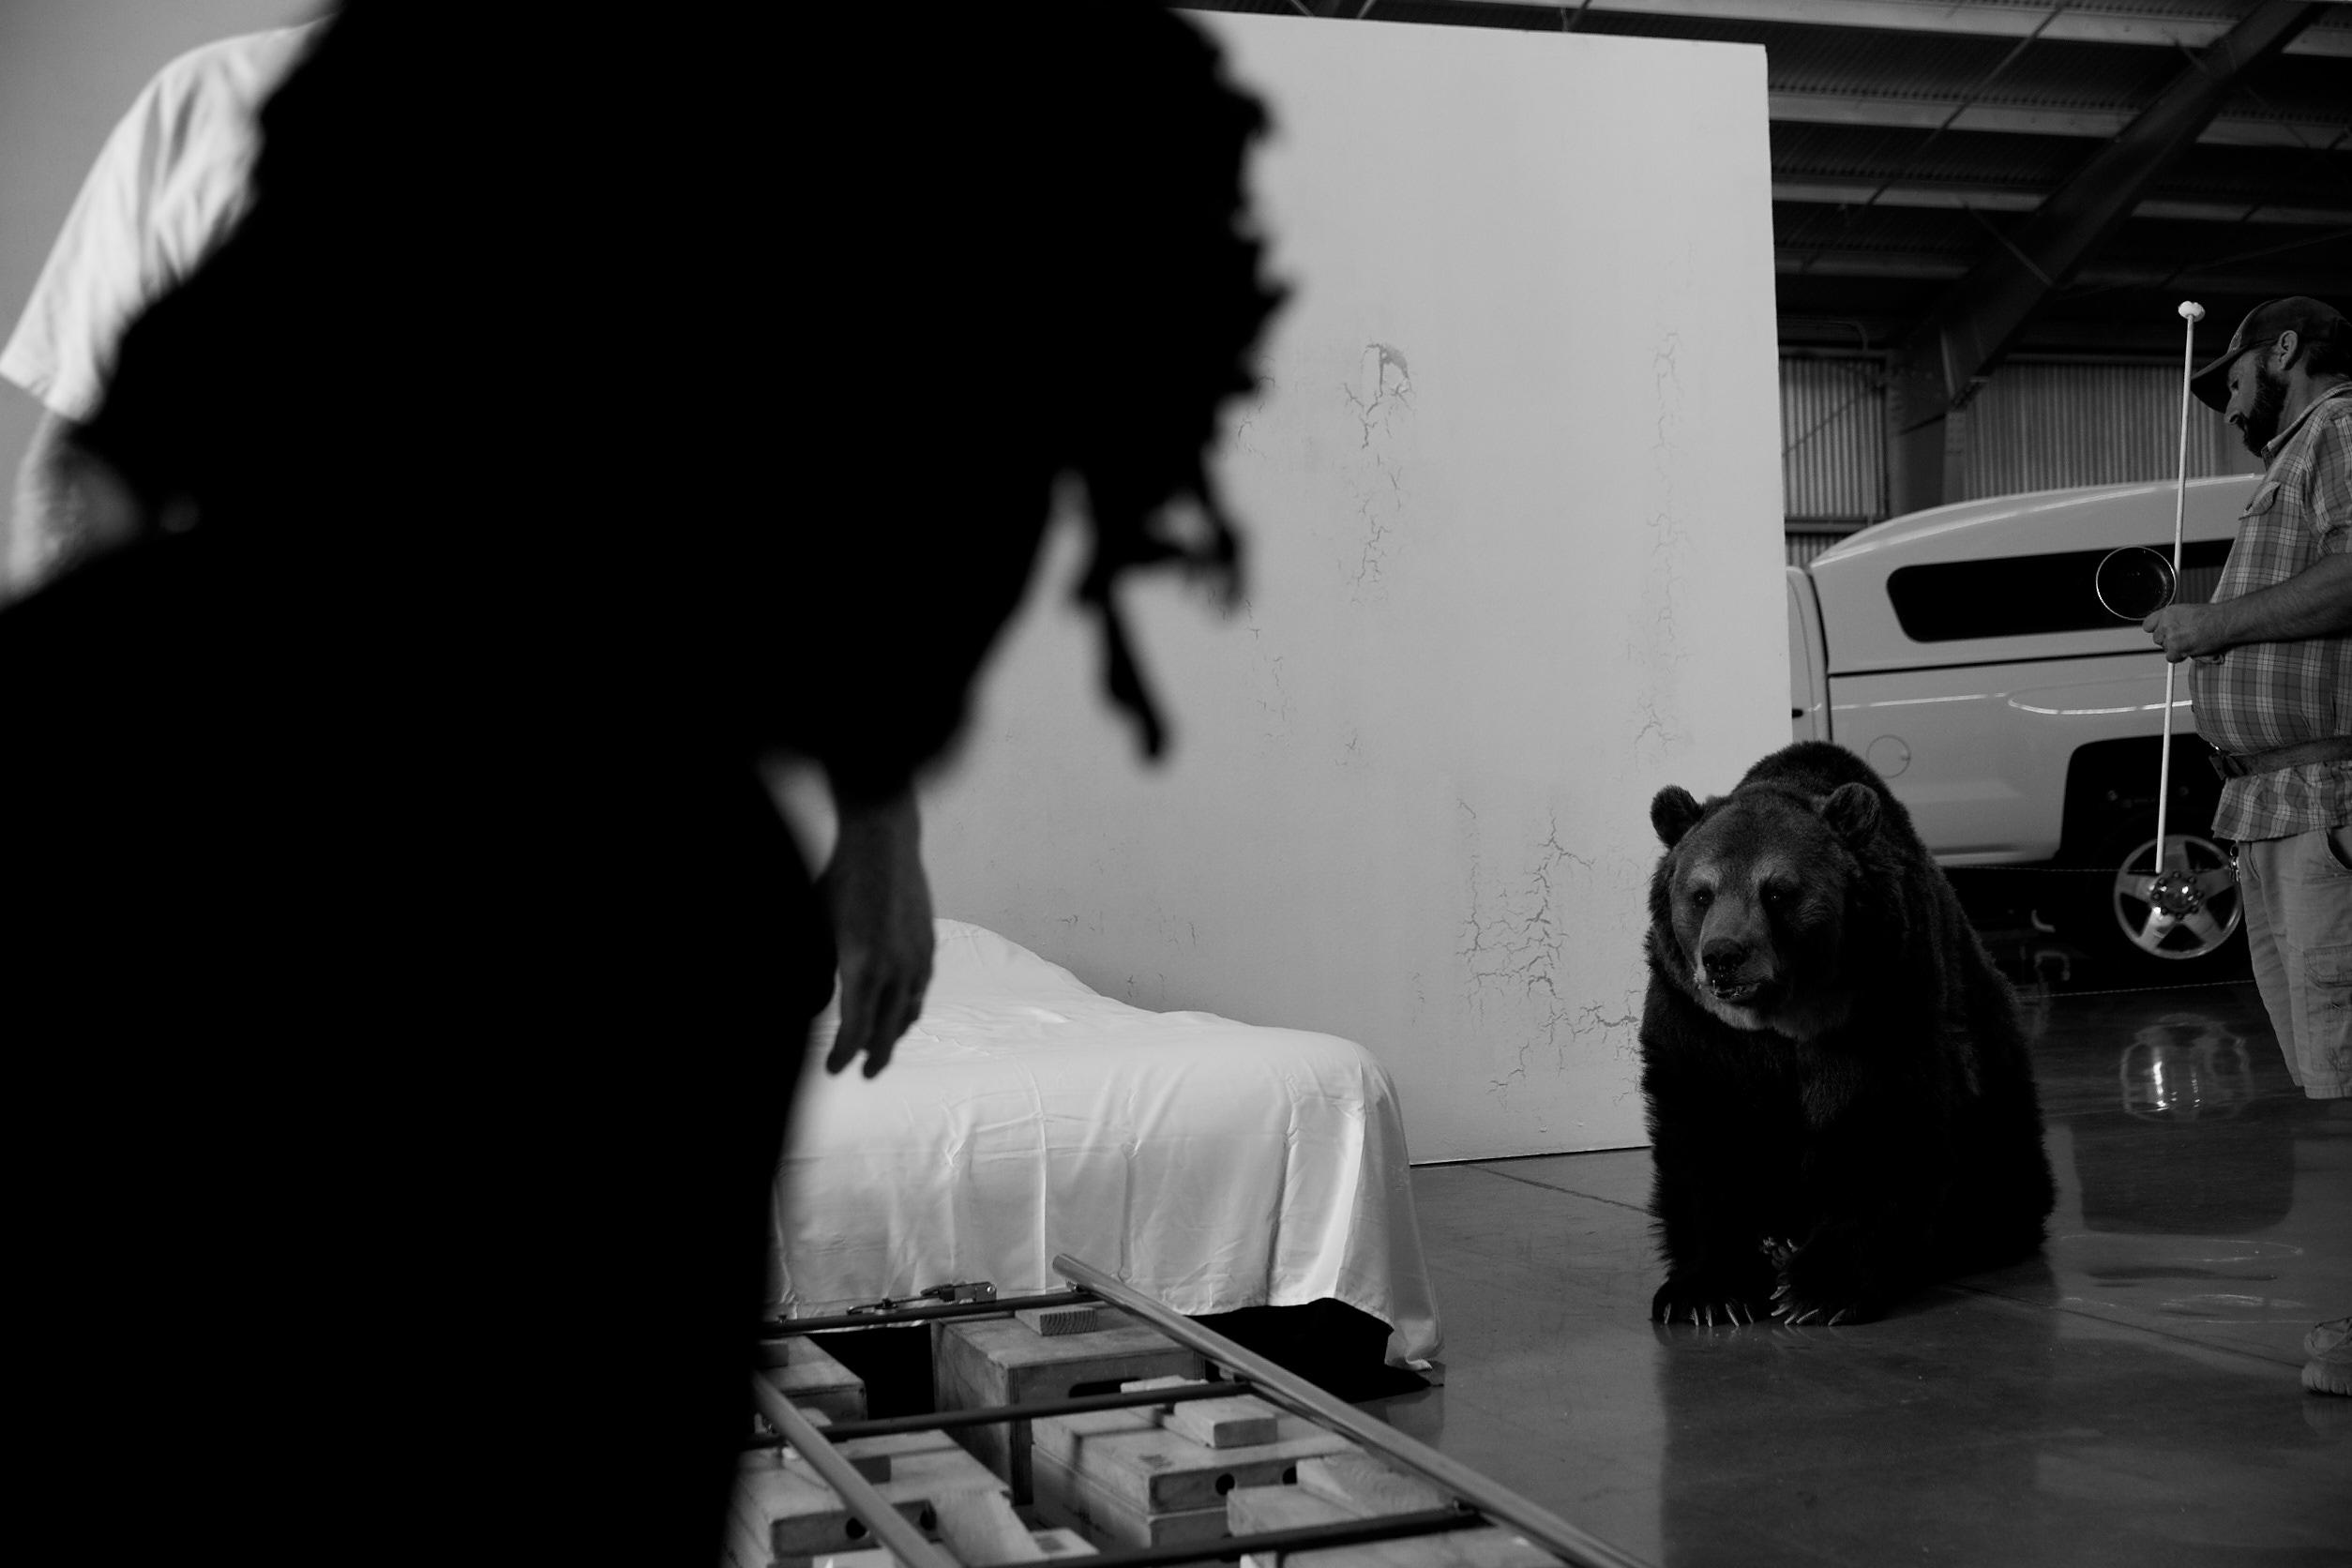 6lack Bear